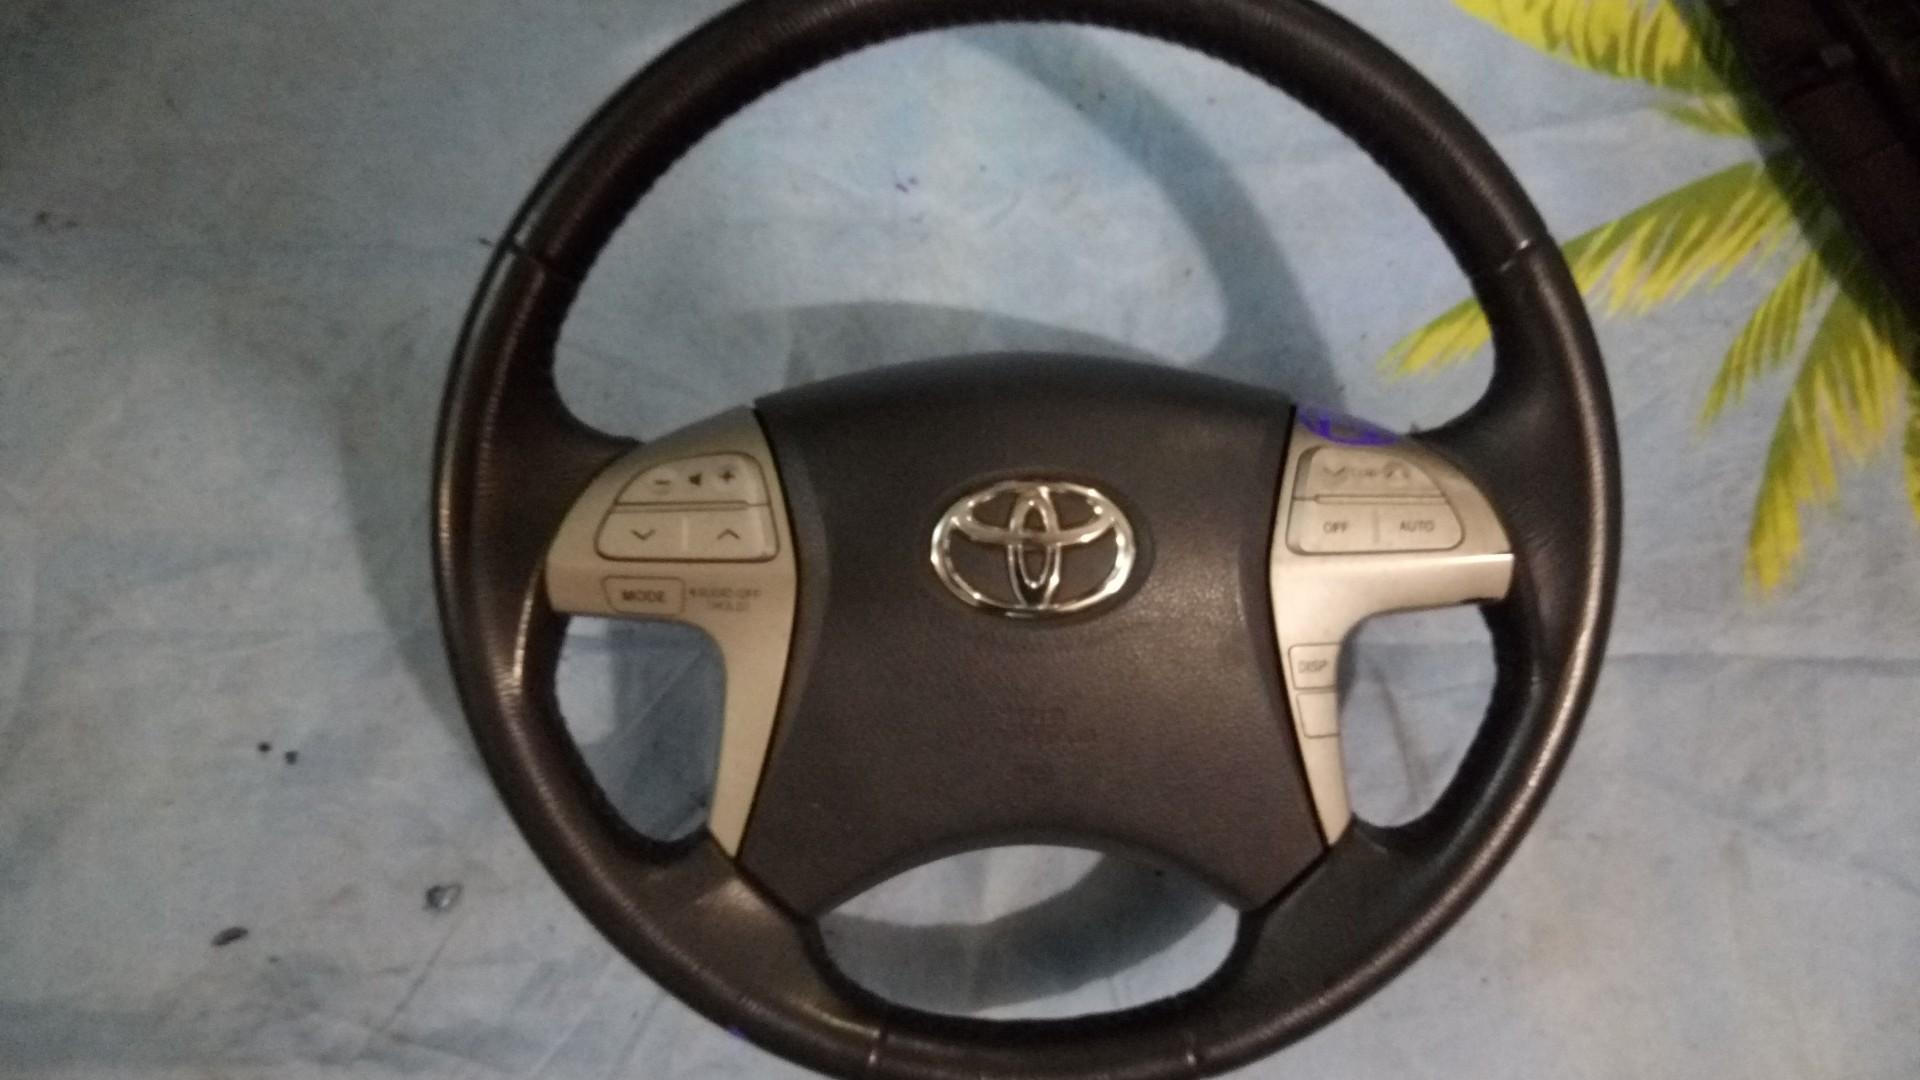 Размер колес на Toyota (Тойота) - Размер колес